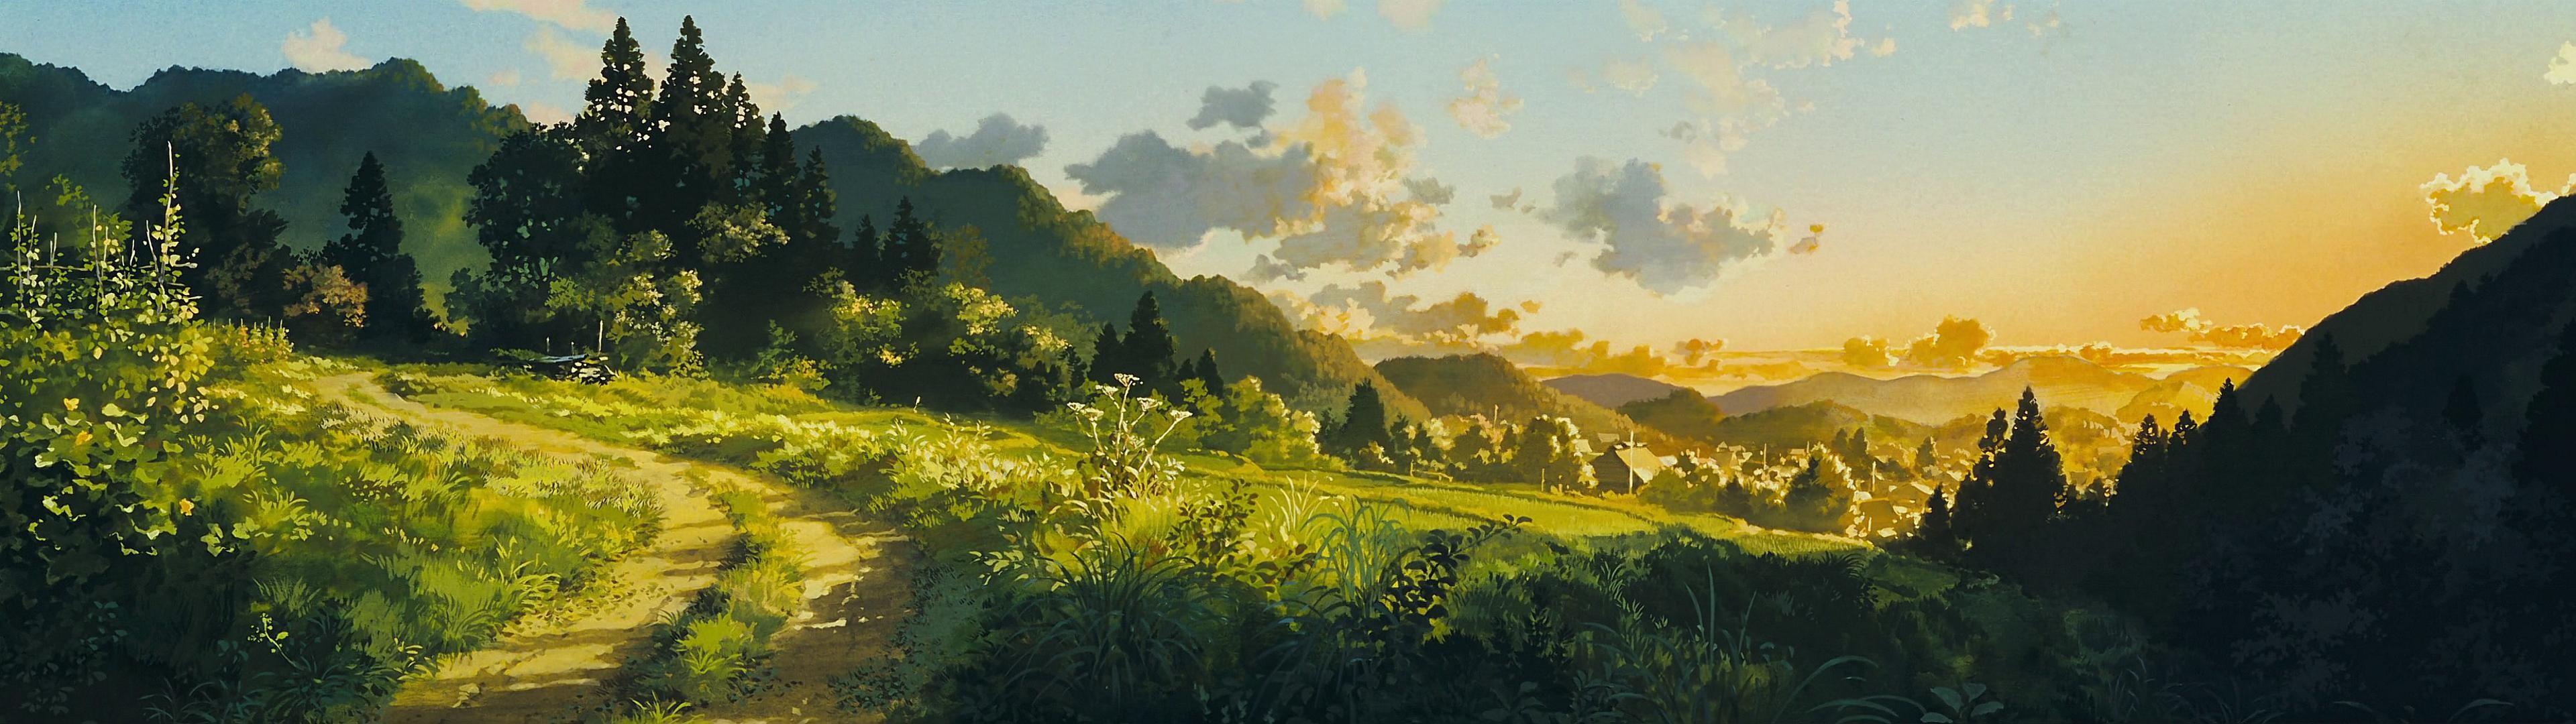 Reuploading The Dual Monitor Studio Ghibli Wallpapers I Saw Here A